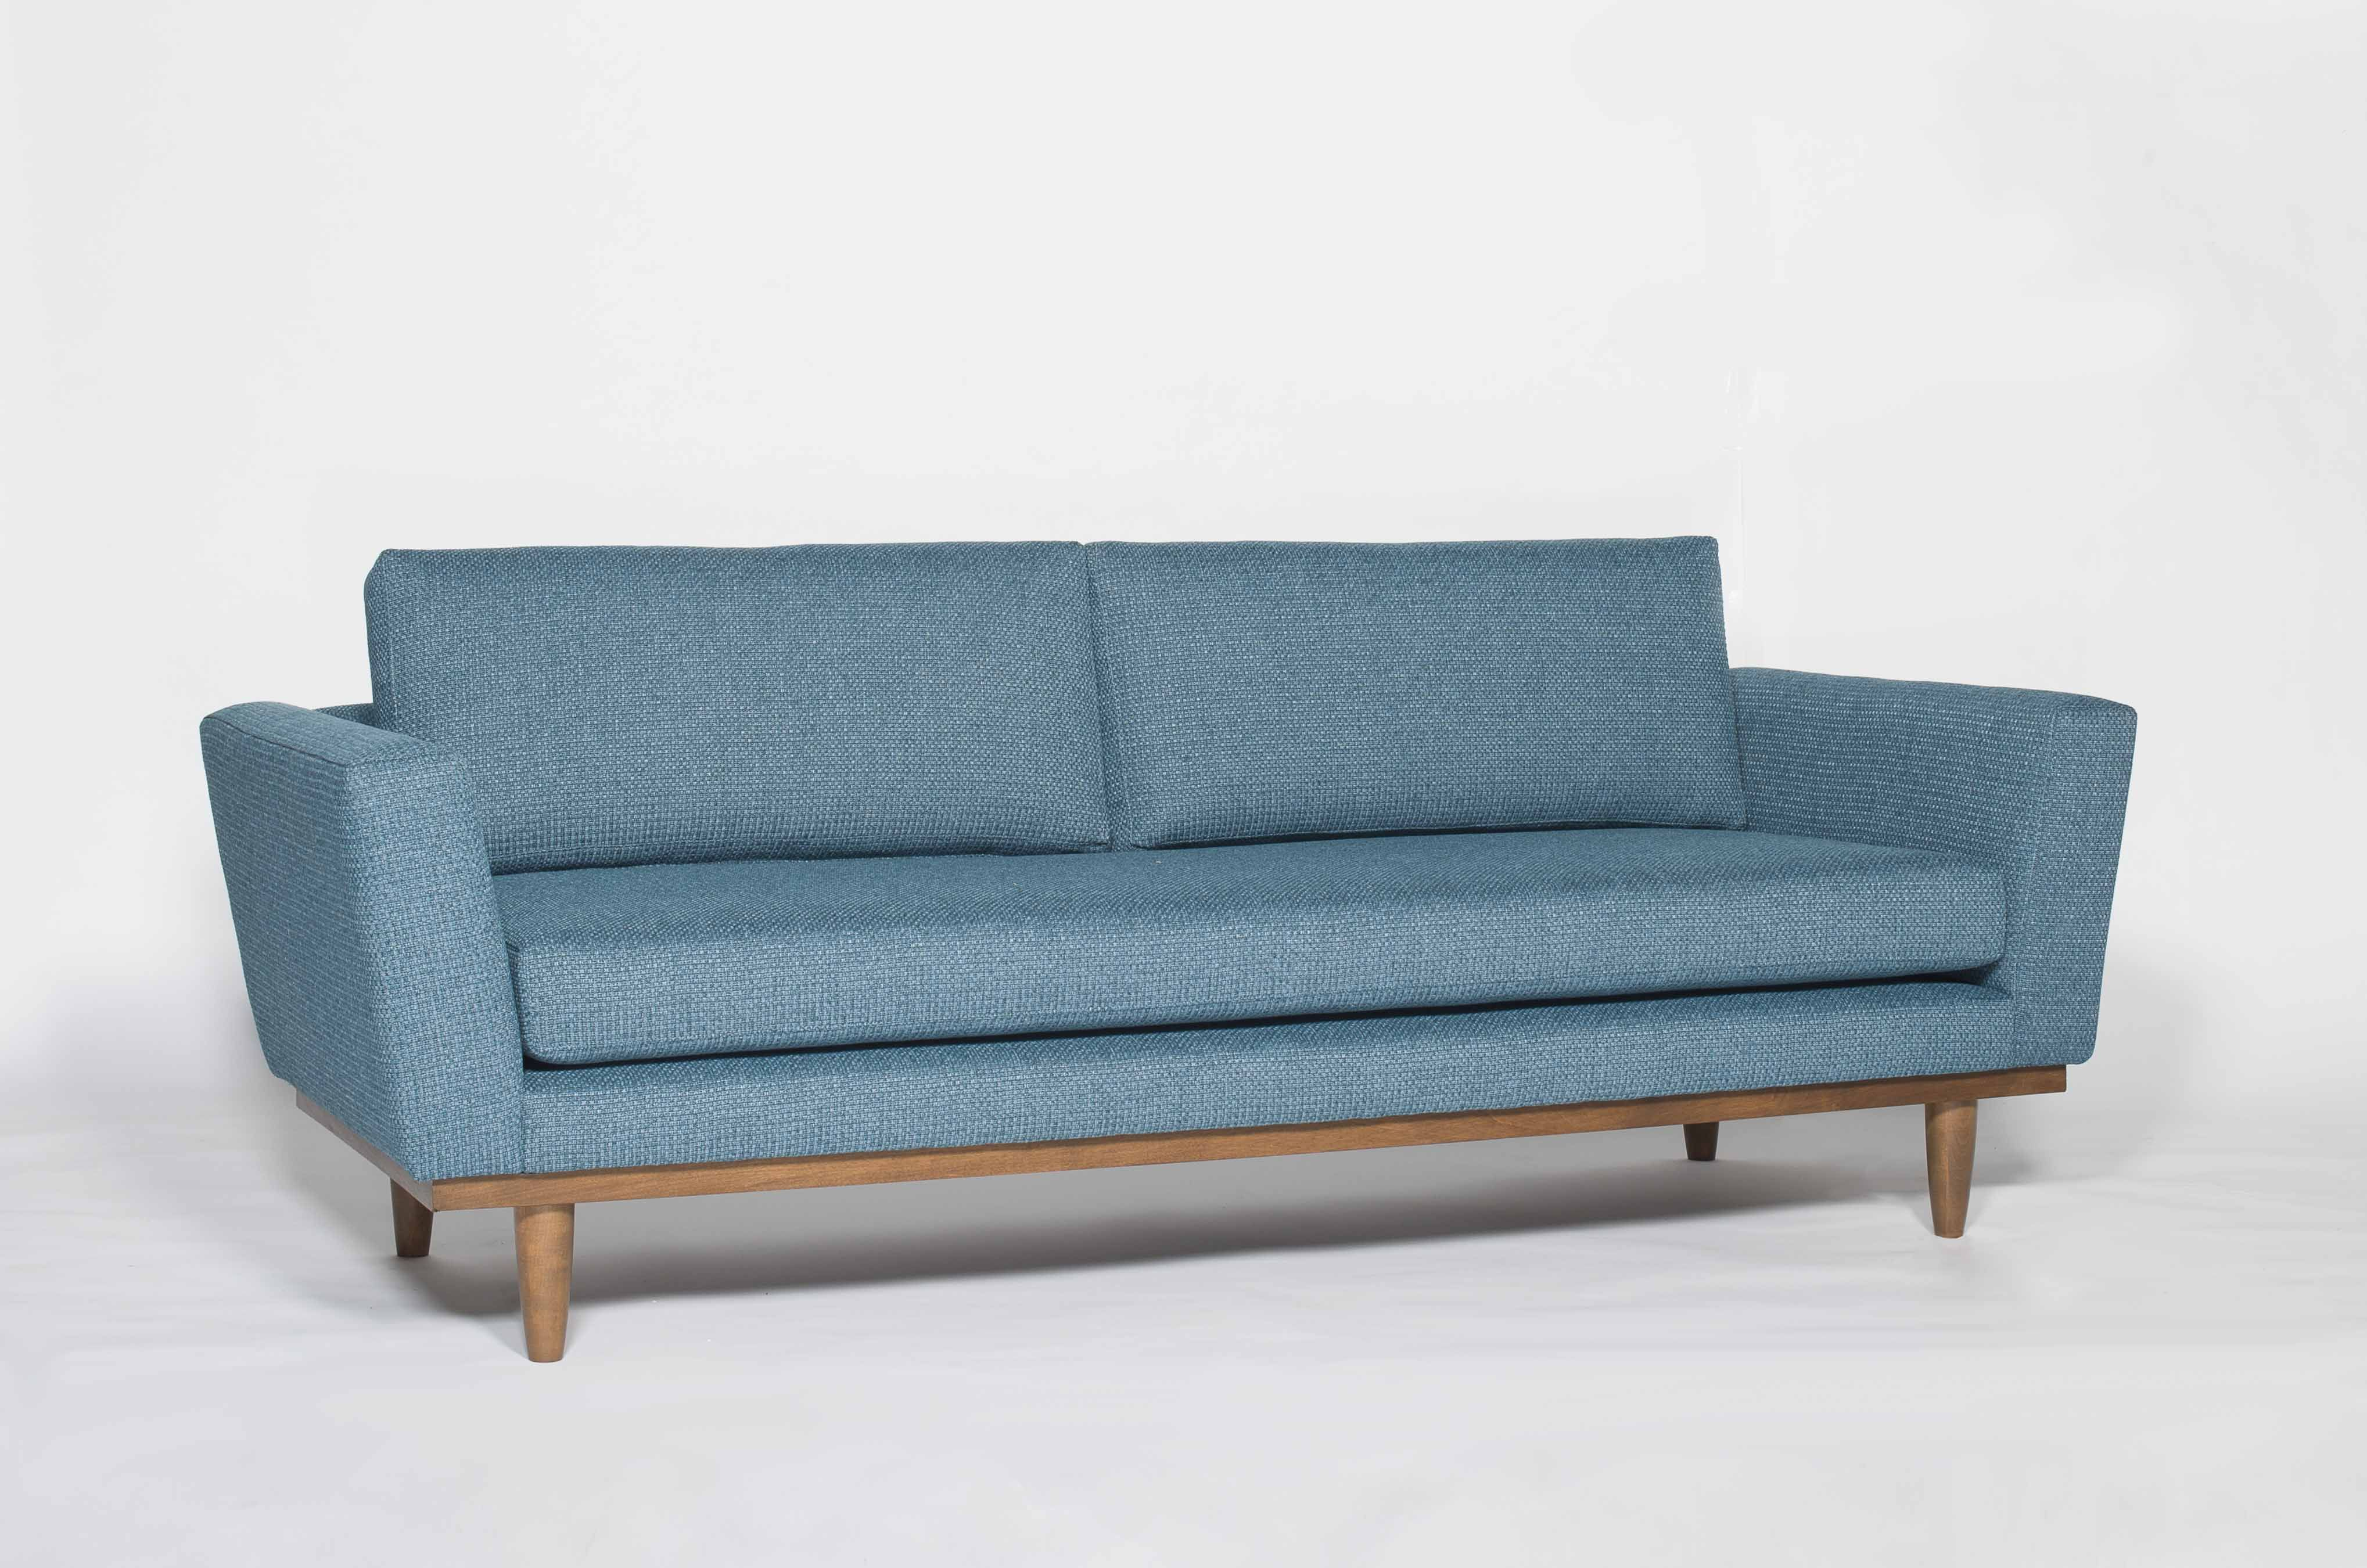 Oslo Scandinavian Mid Century Inspired Sofa 1 Seat Idee Deco Interieur Meuble Deco Interieure